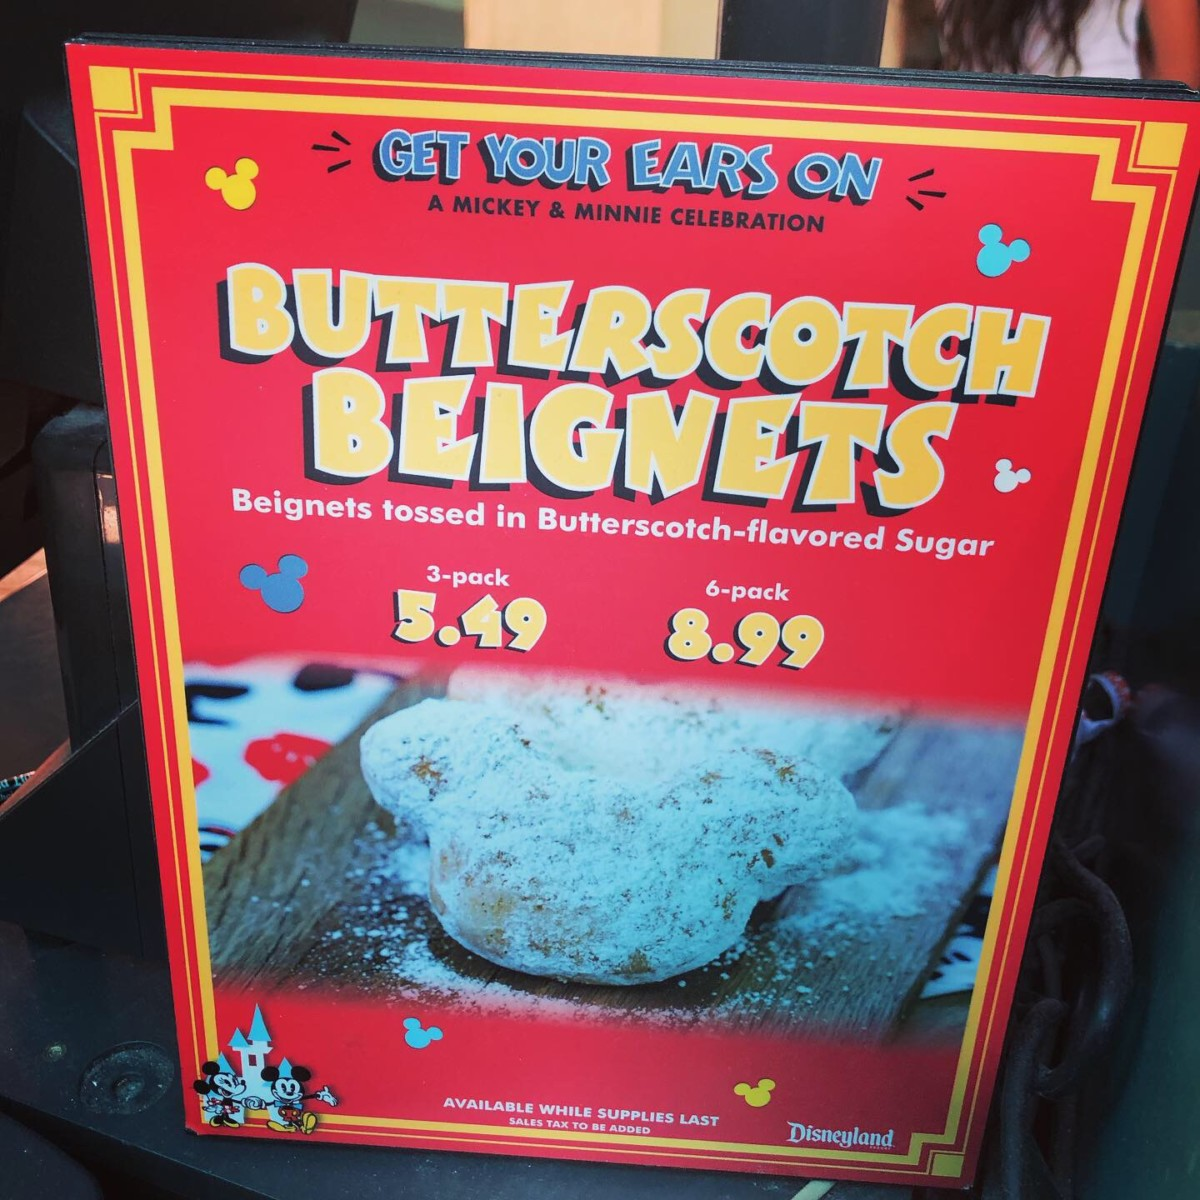 Butterscotch Beignets at Disneyland 2